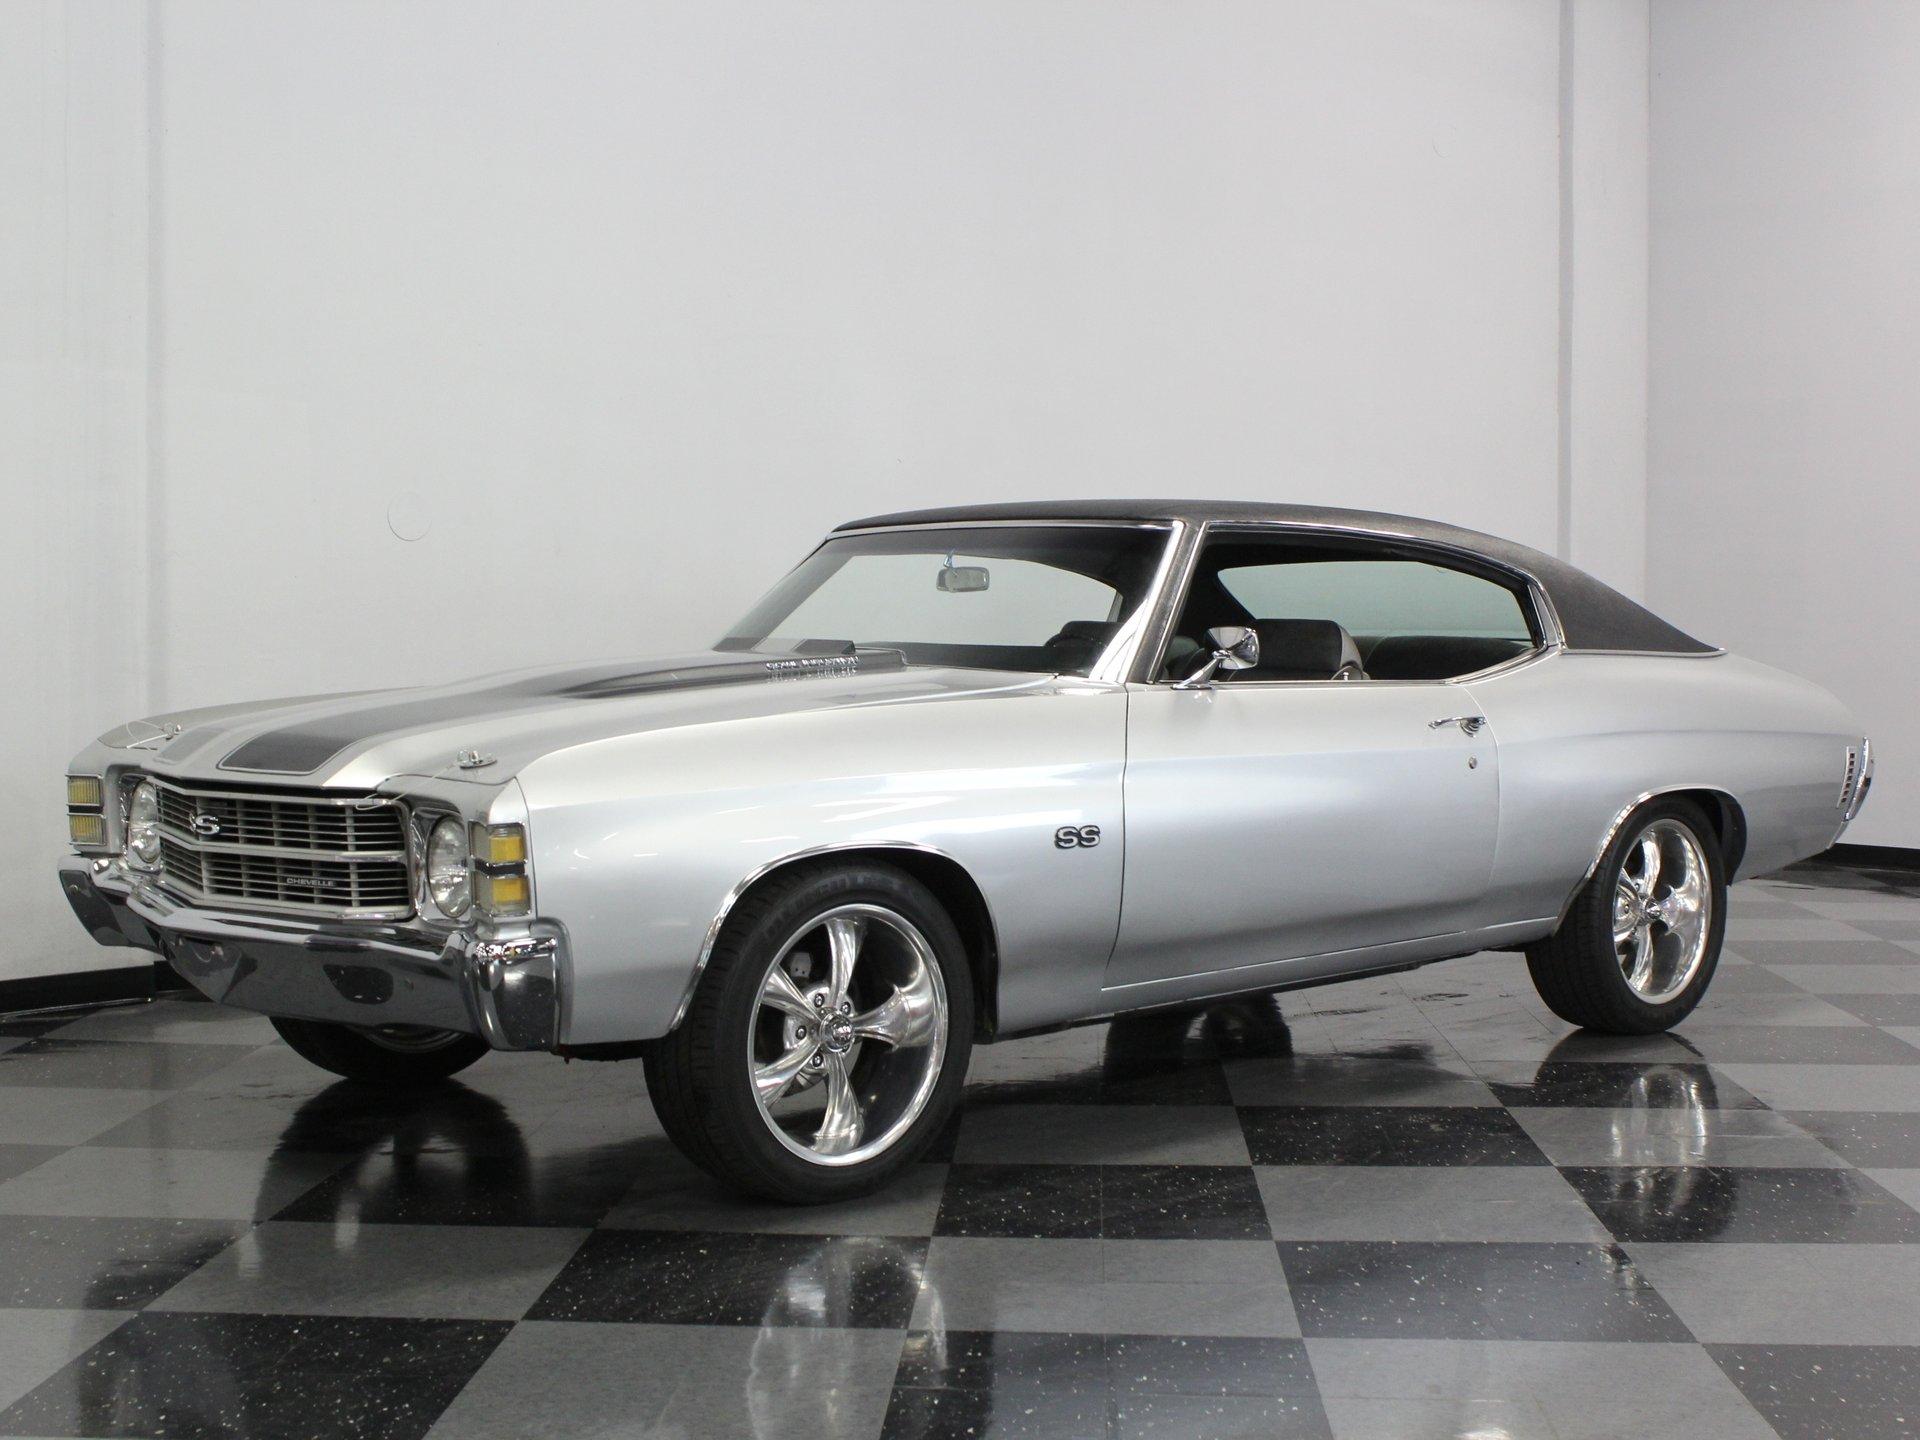 1971 chevrolet chevelle ss 454 clone